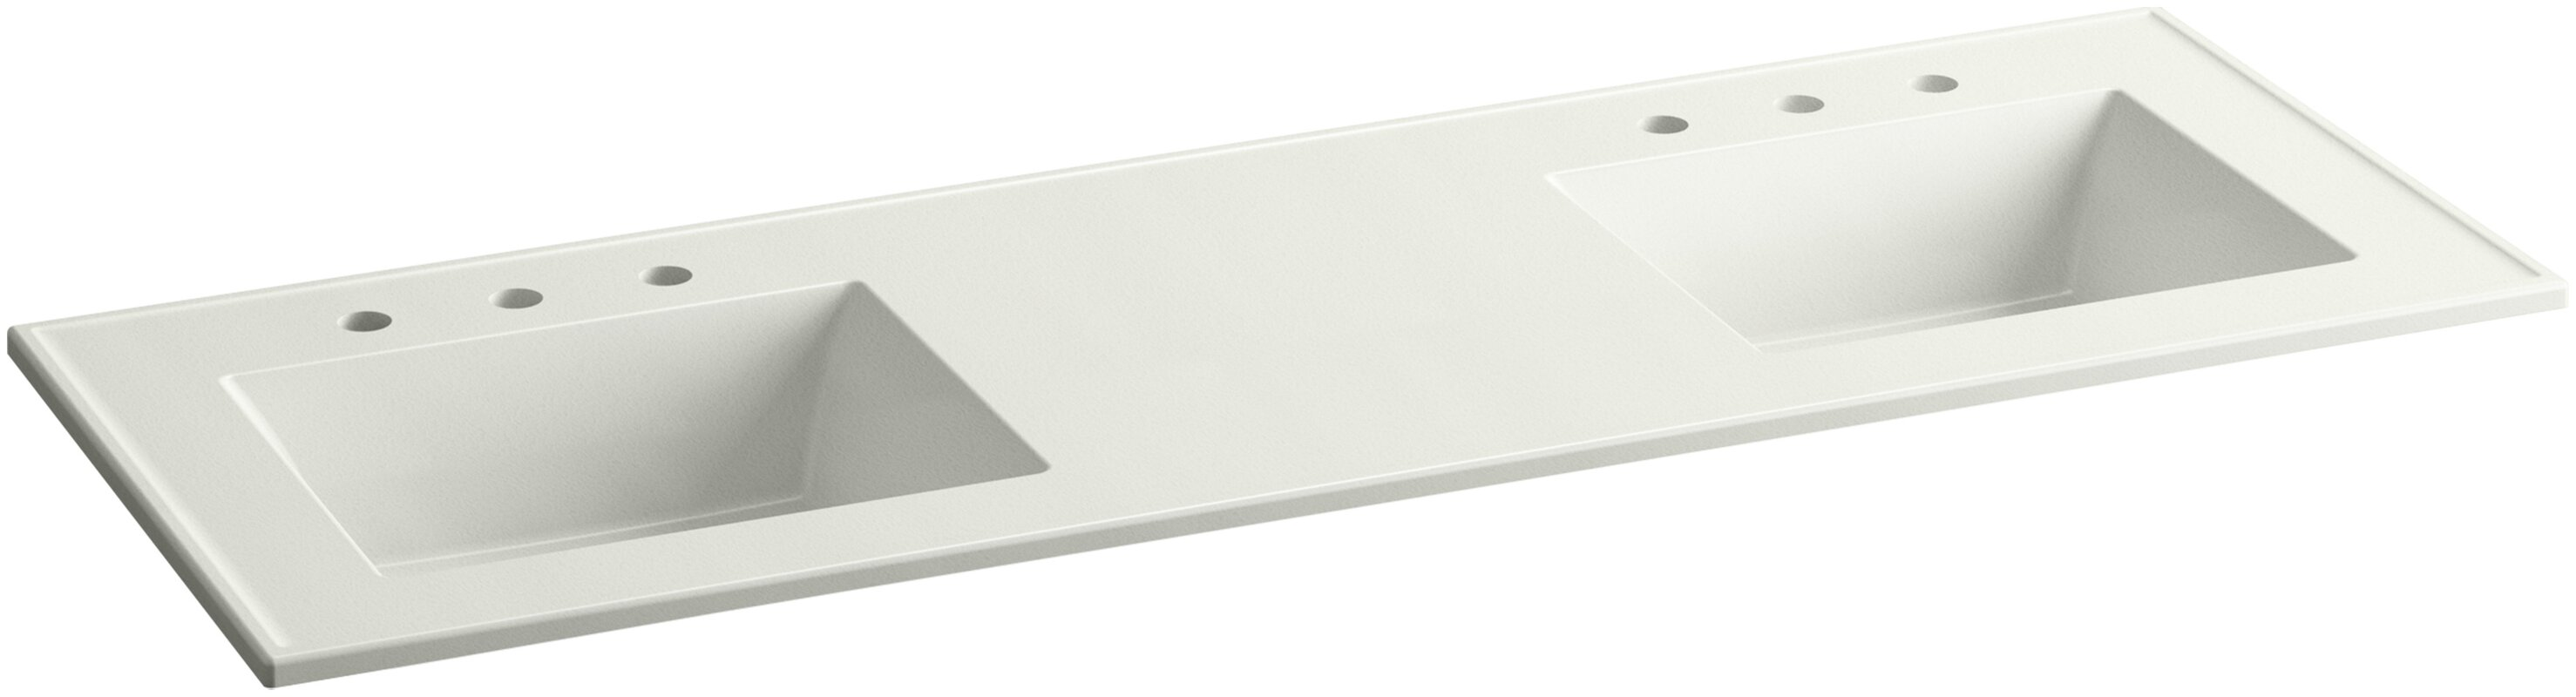 Bathroom vanity tops with sink - Ceramic Impressions 61 Double Bathroom Vanity Top